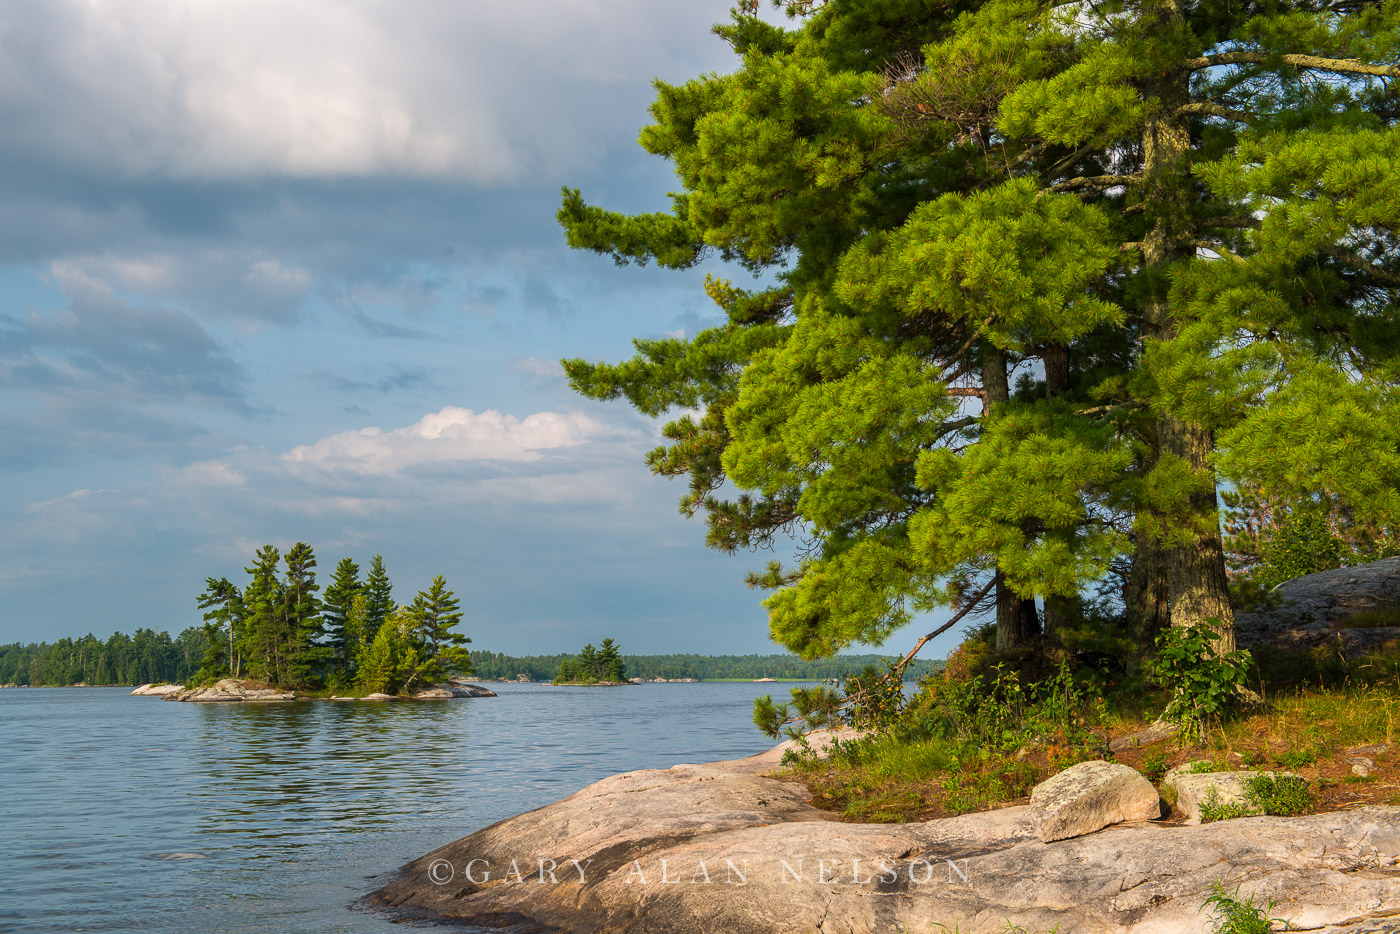 minnesota, voyageurs national park, islands, white pines, photo